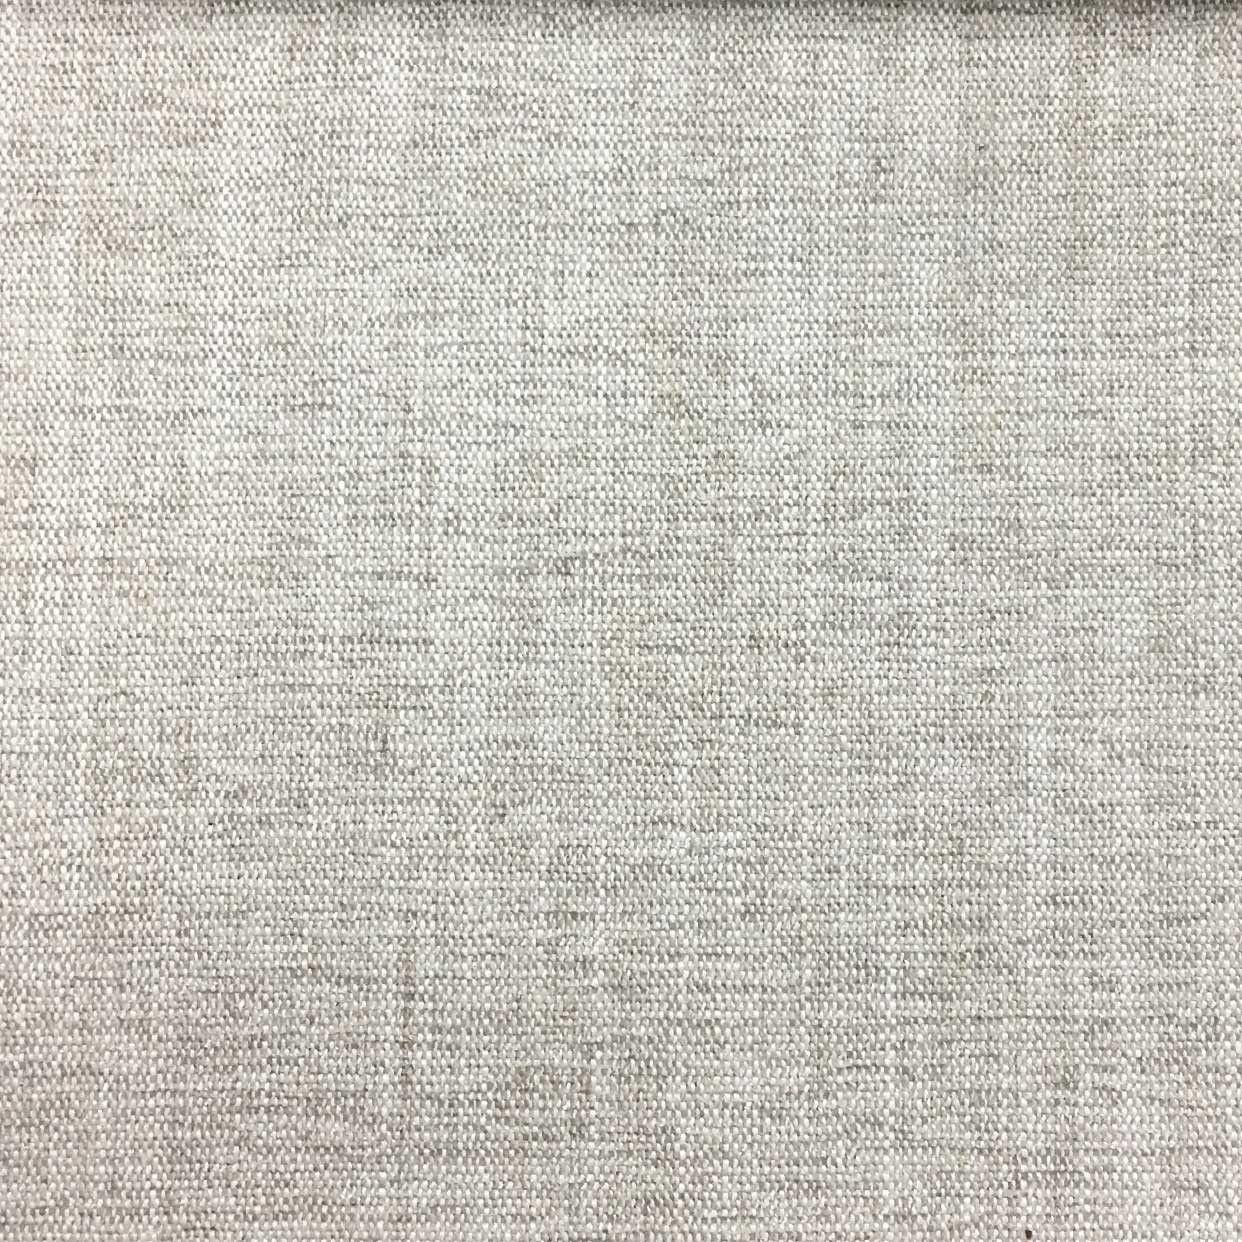 Bronson Linen Blend Textured Chenille Upholstery Fabric Drapes